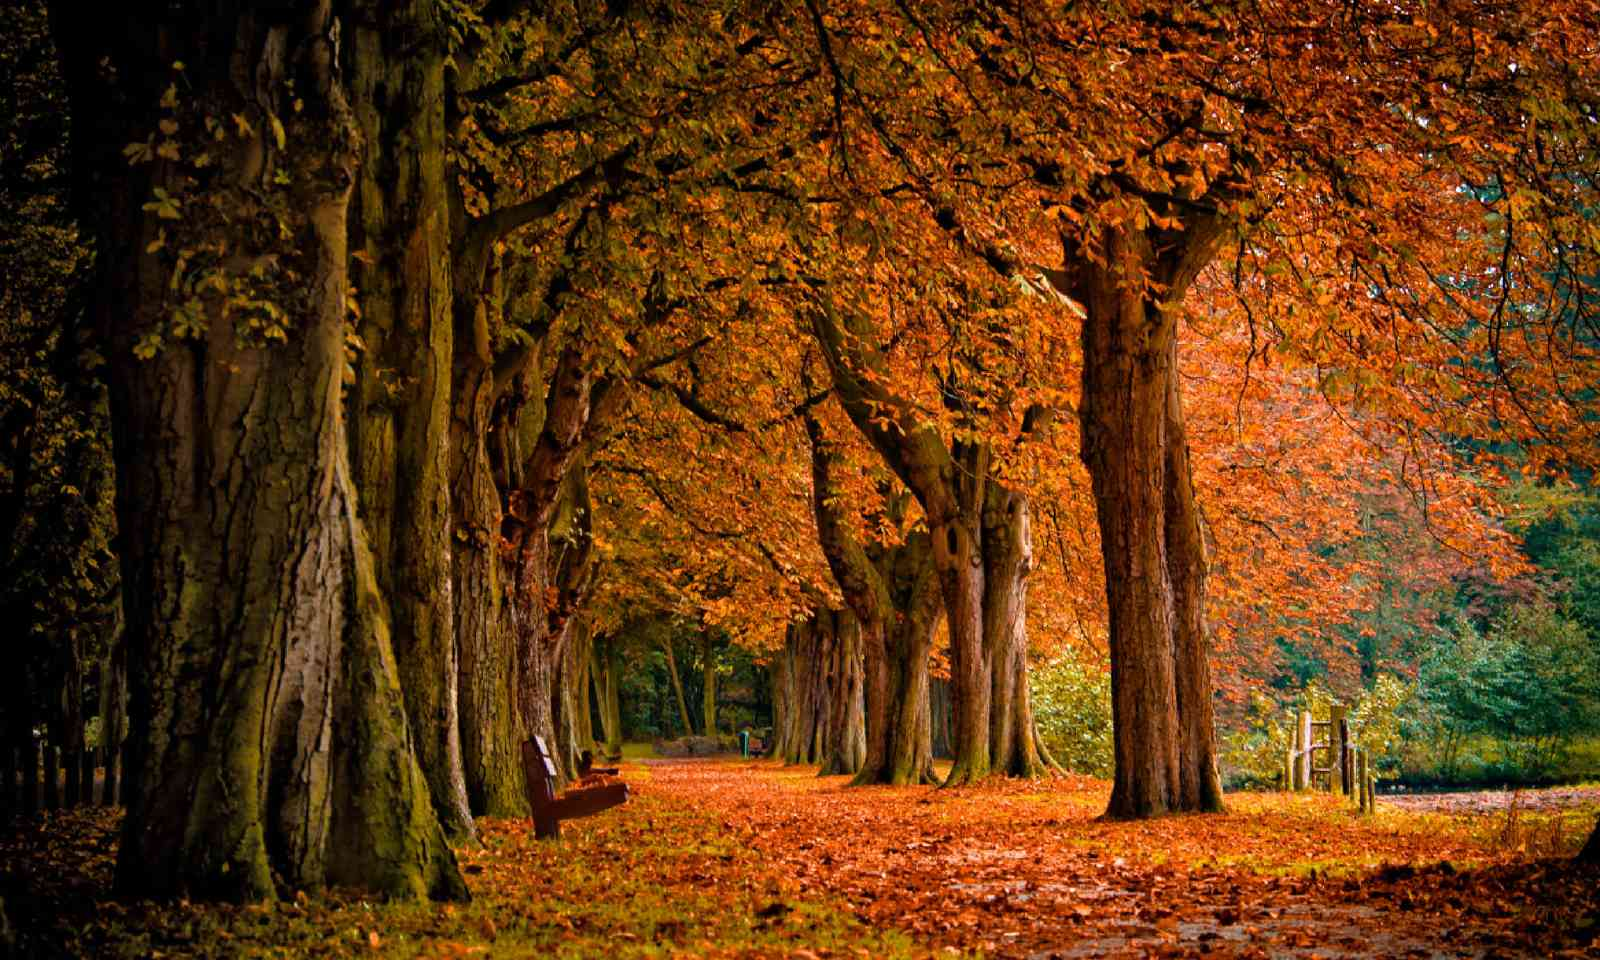 Autumn forest (Shutterstock)